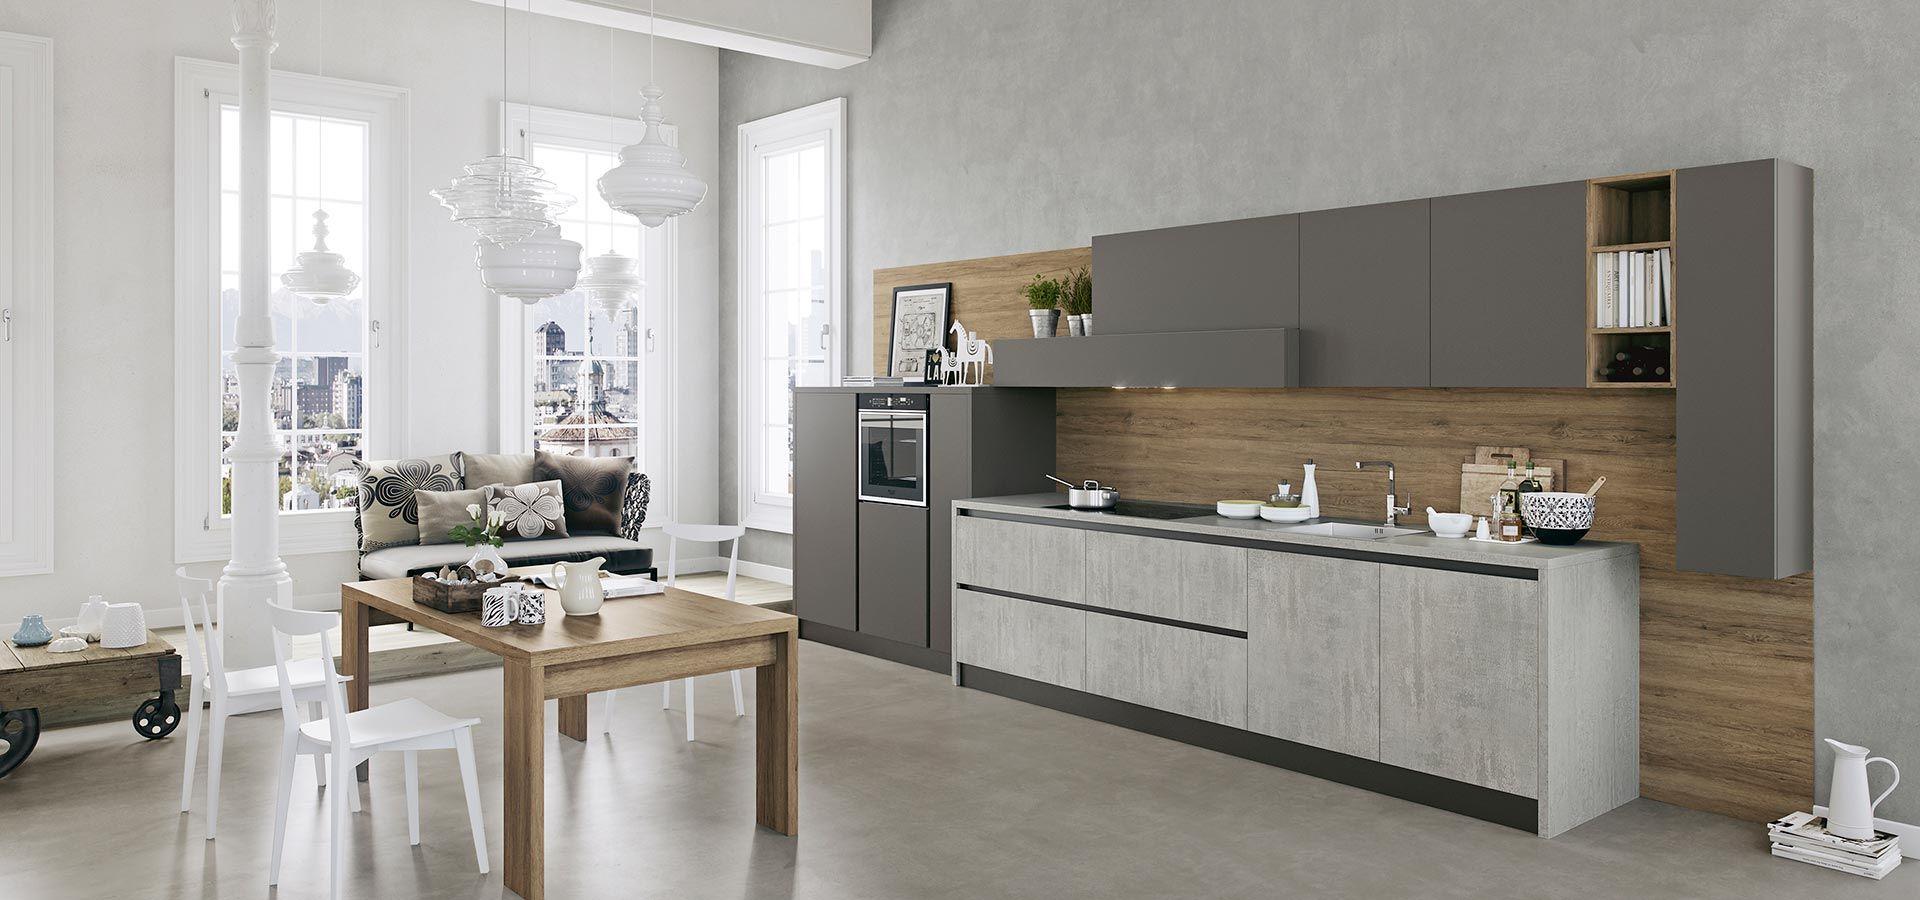 Cucina Moderna - Kalì Finitura cemento e maxximatt lavagna   Piano ...